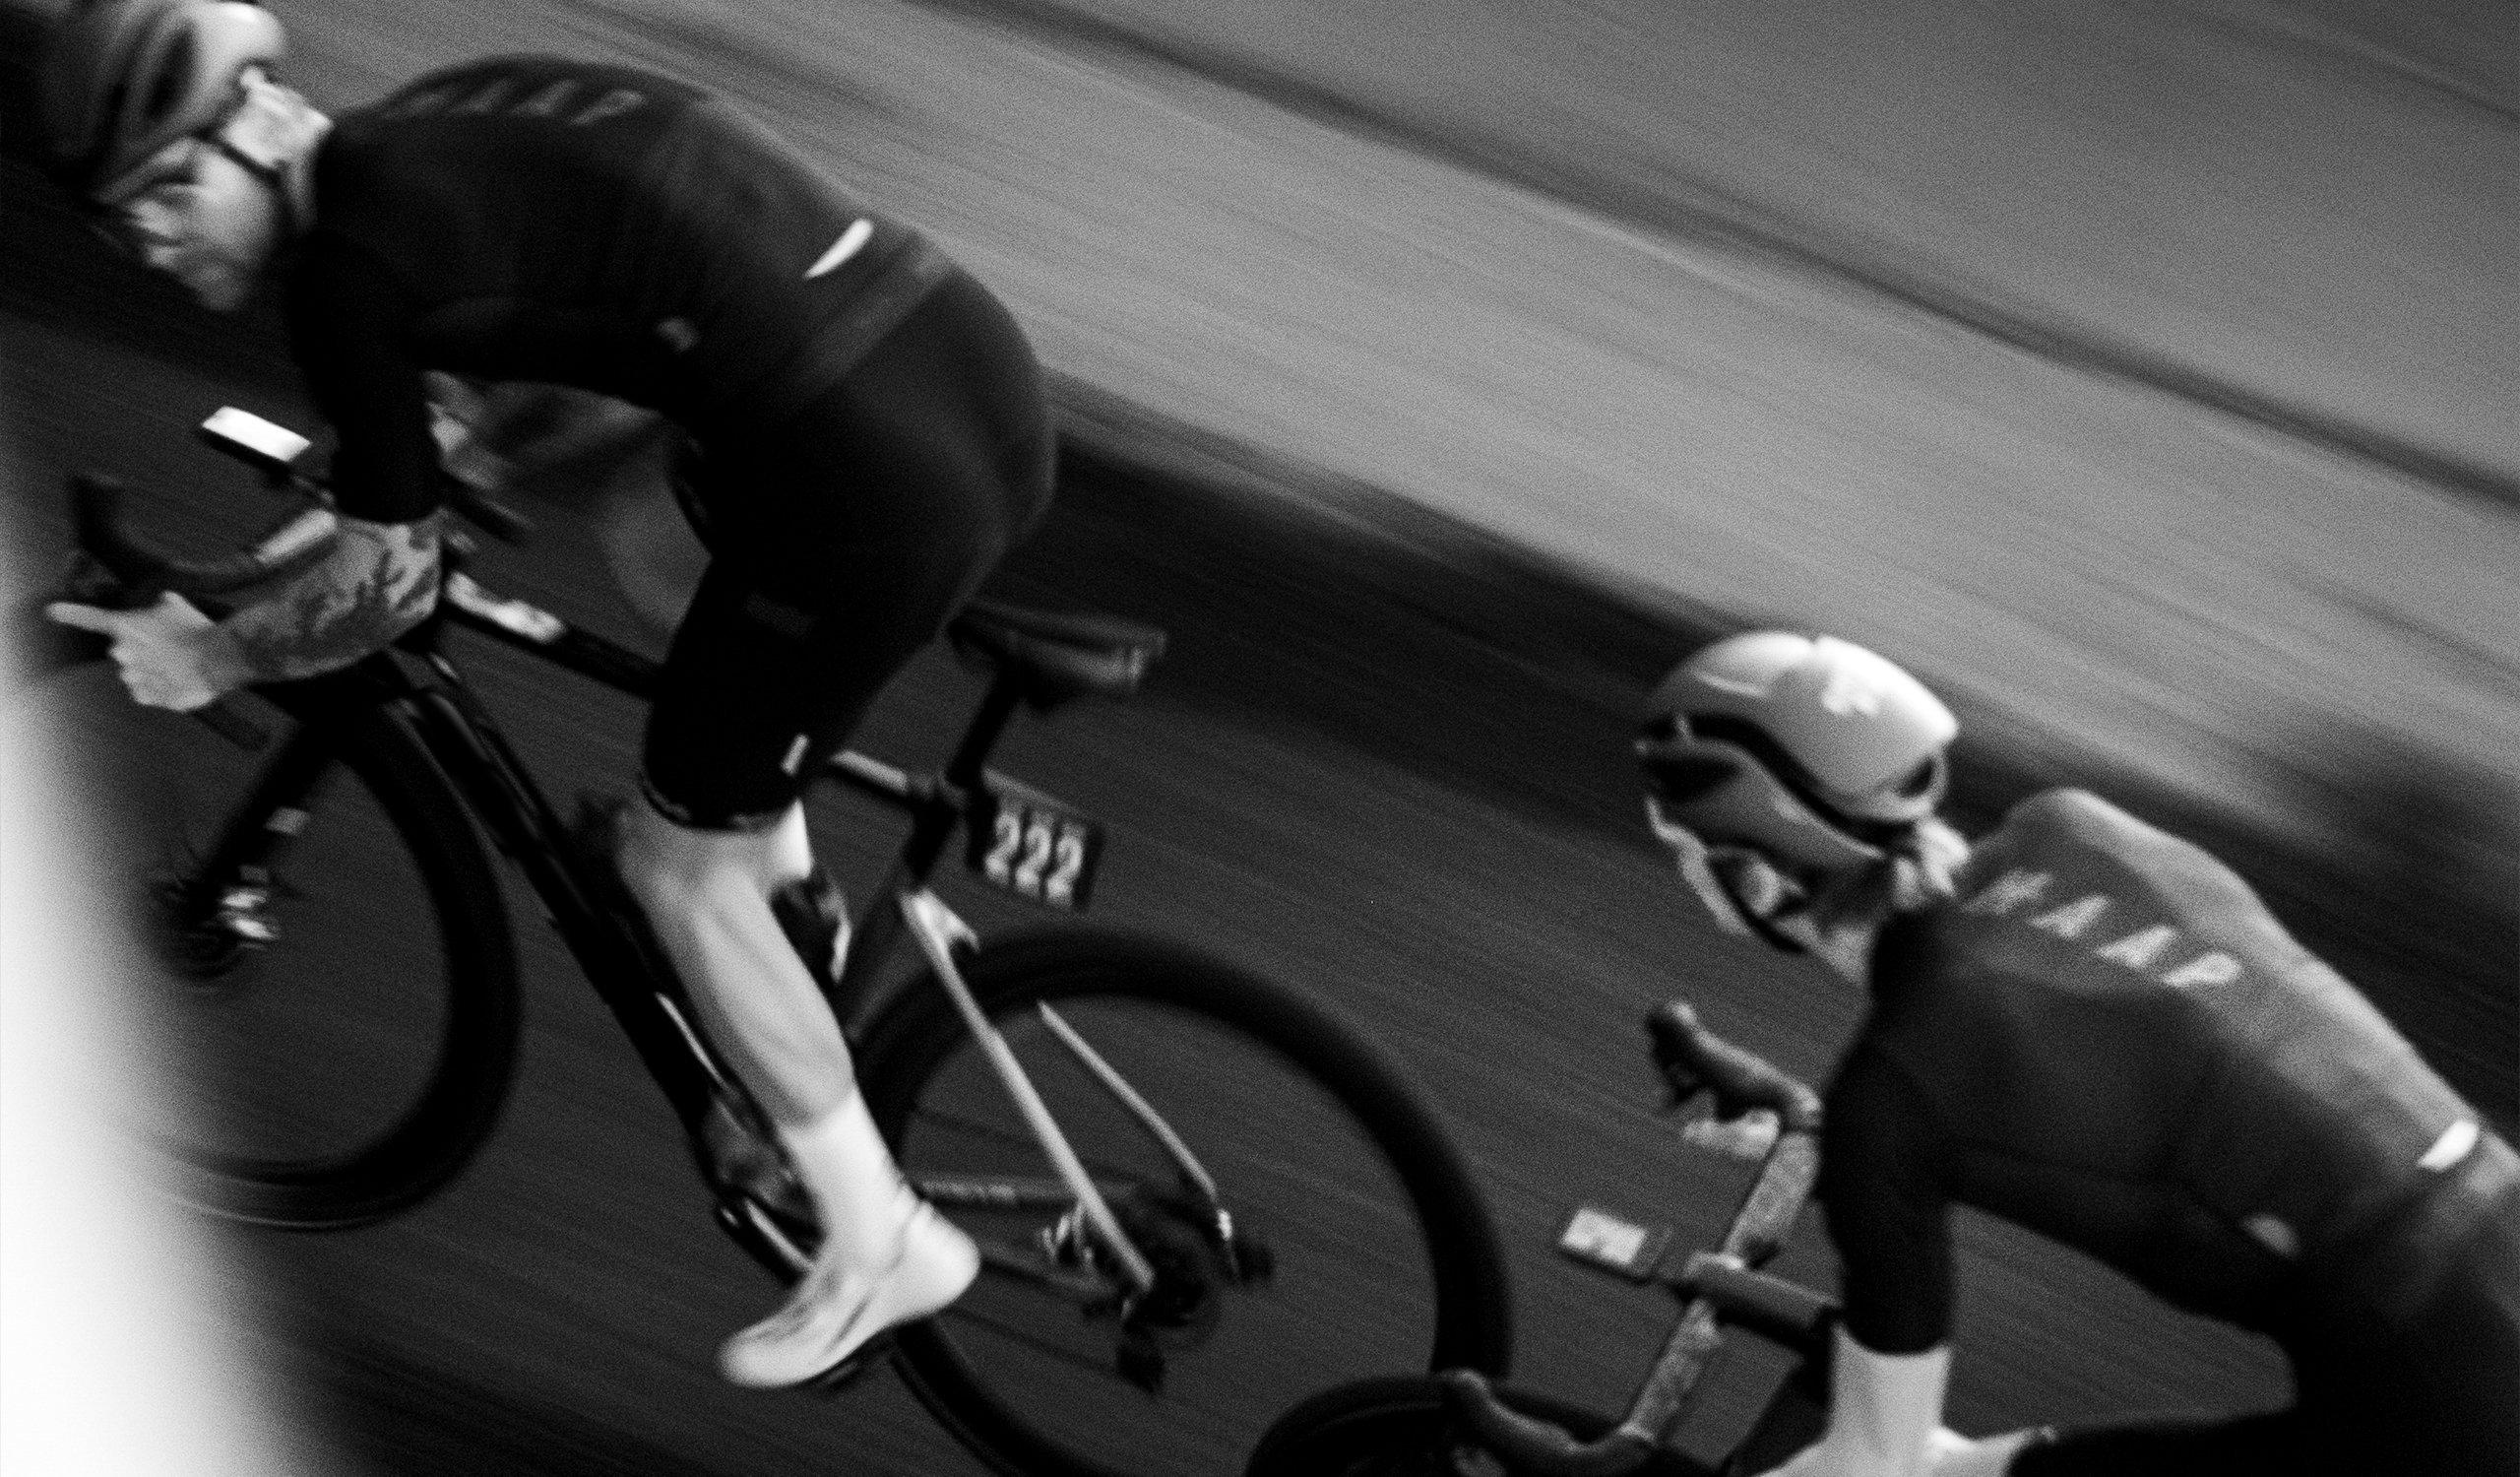 Men's Stealth Race Fit Jersey / Ink